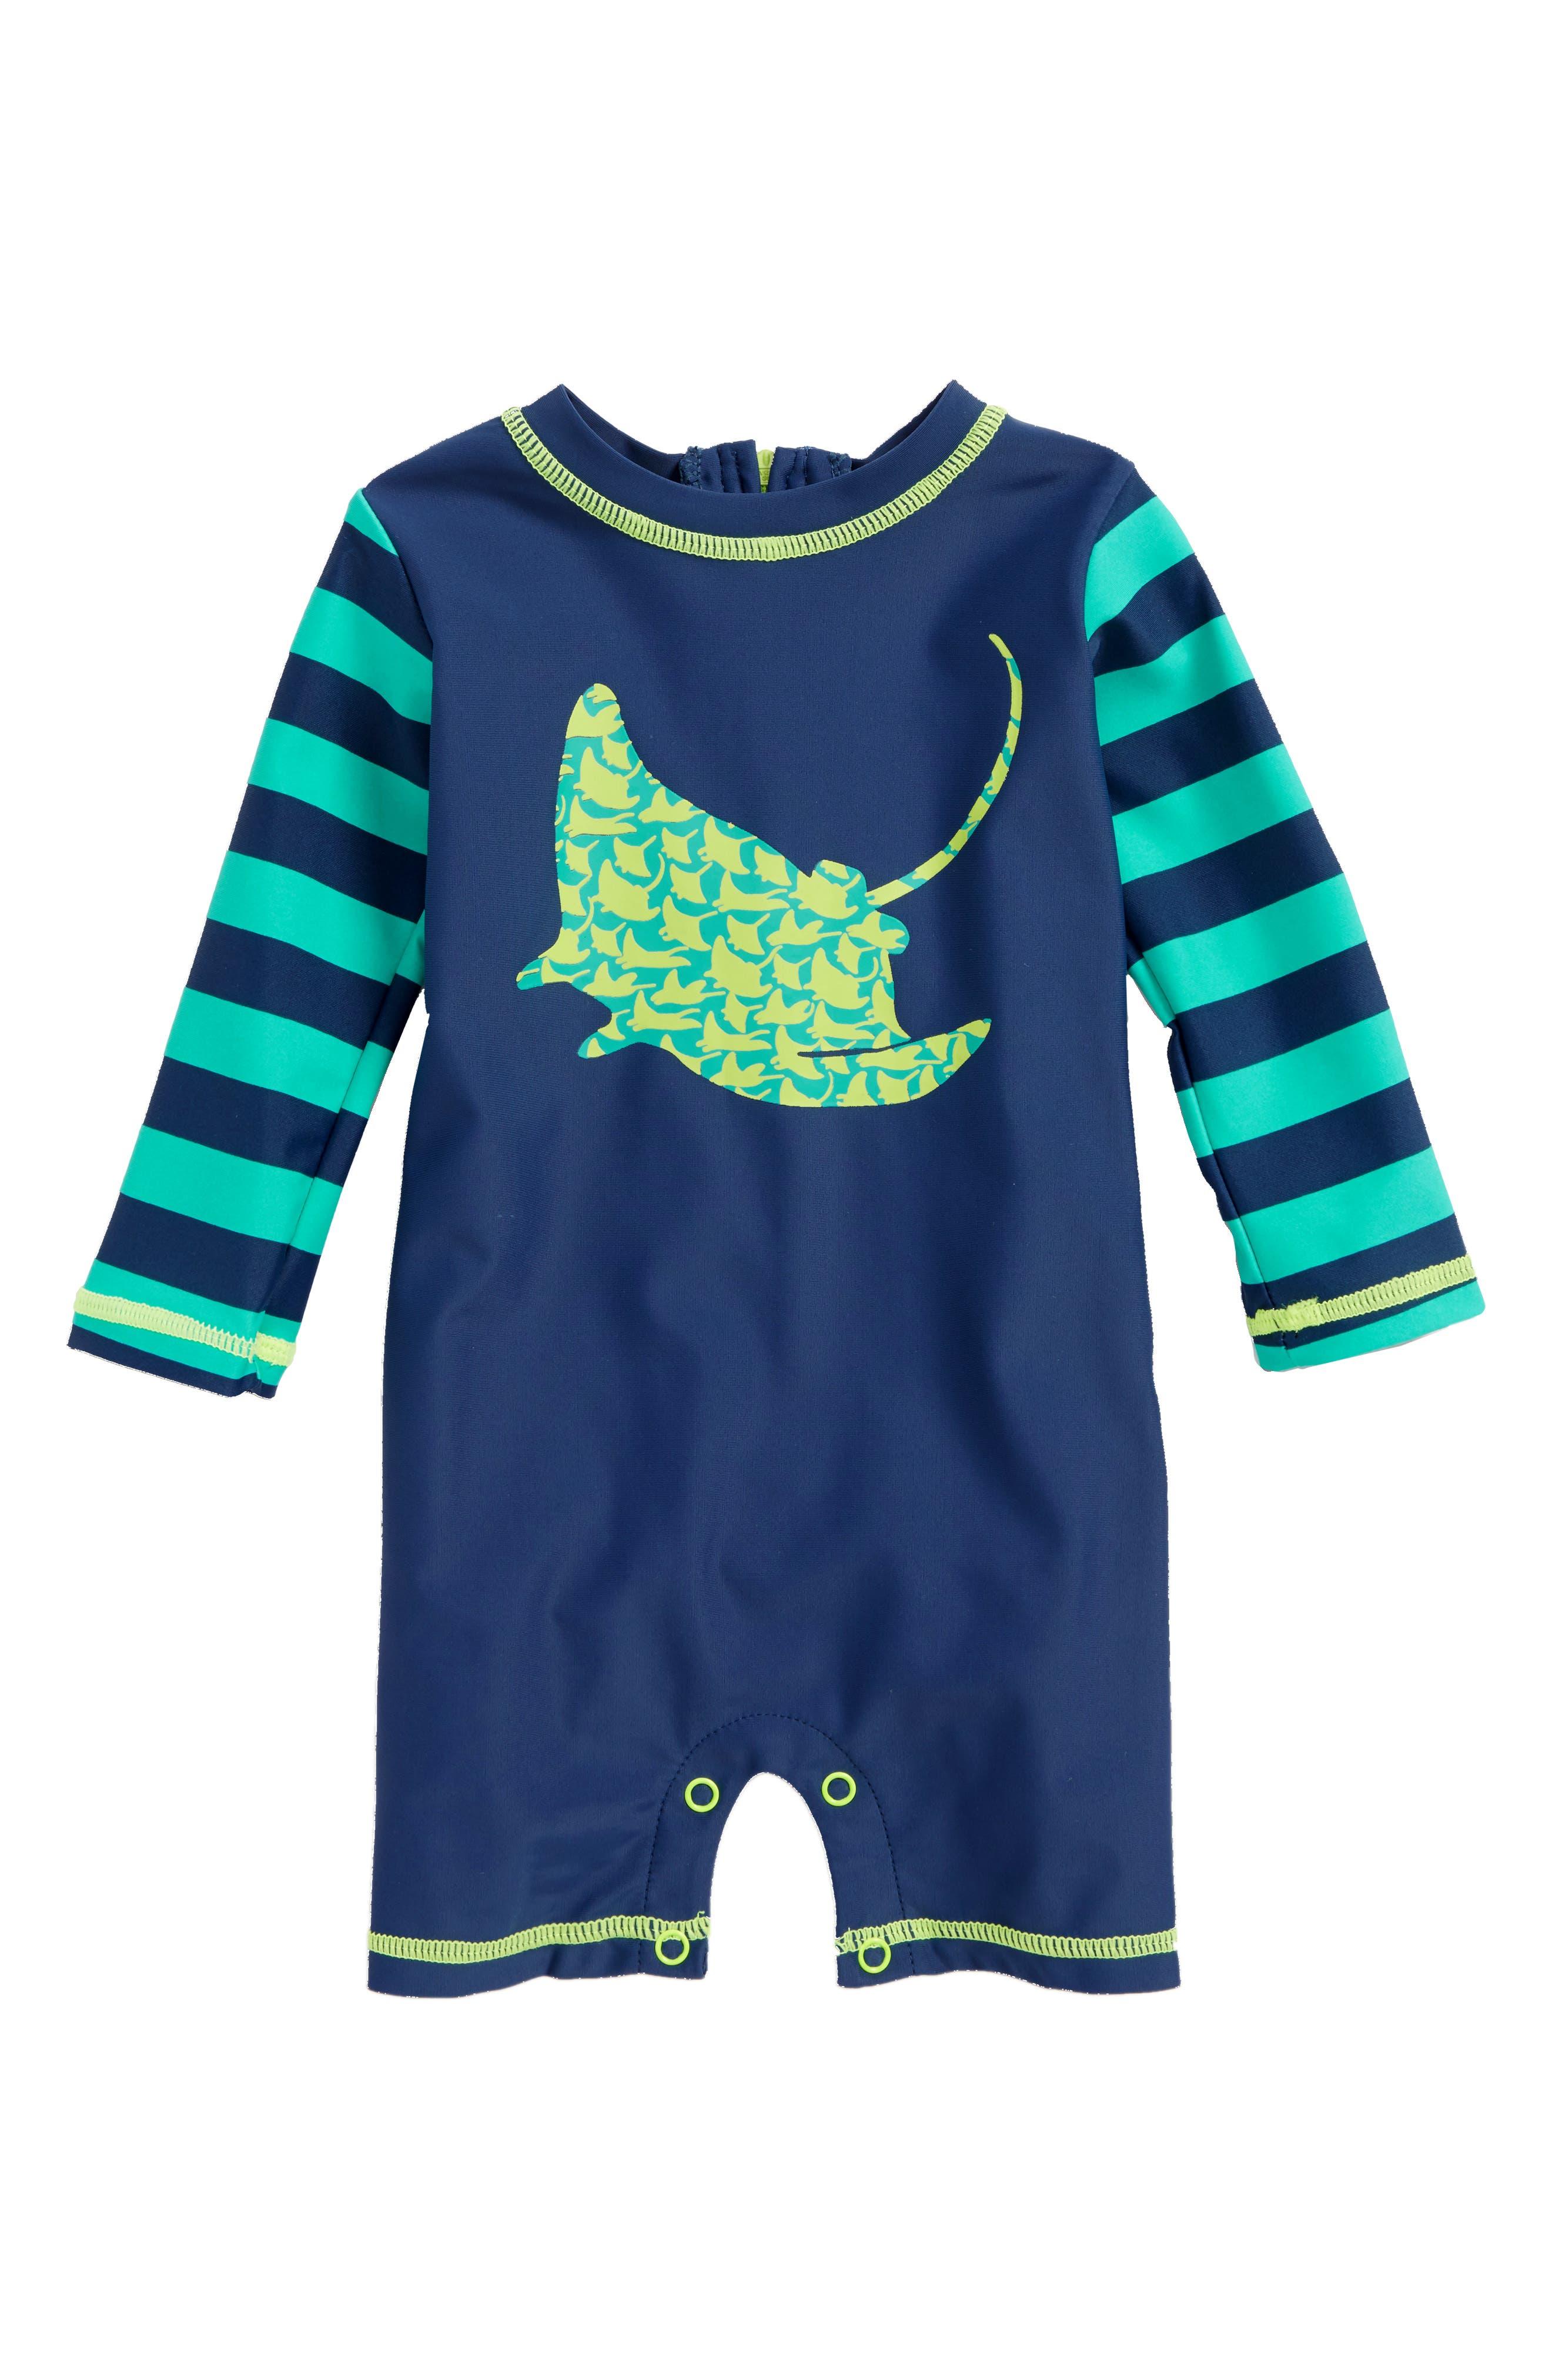 Main Image - Hatley One-Piece Rashguard Swimsuit (Baby Boys)